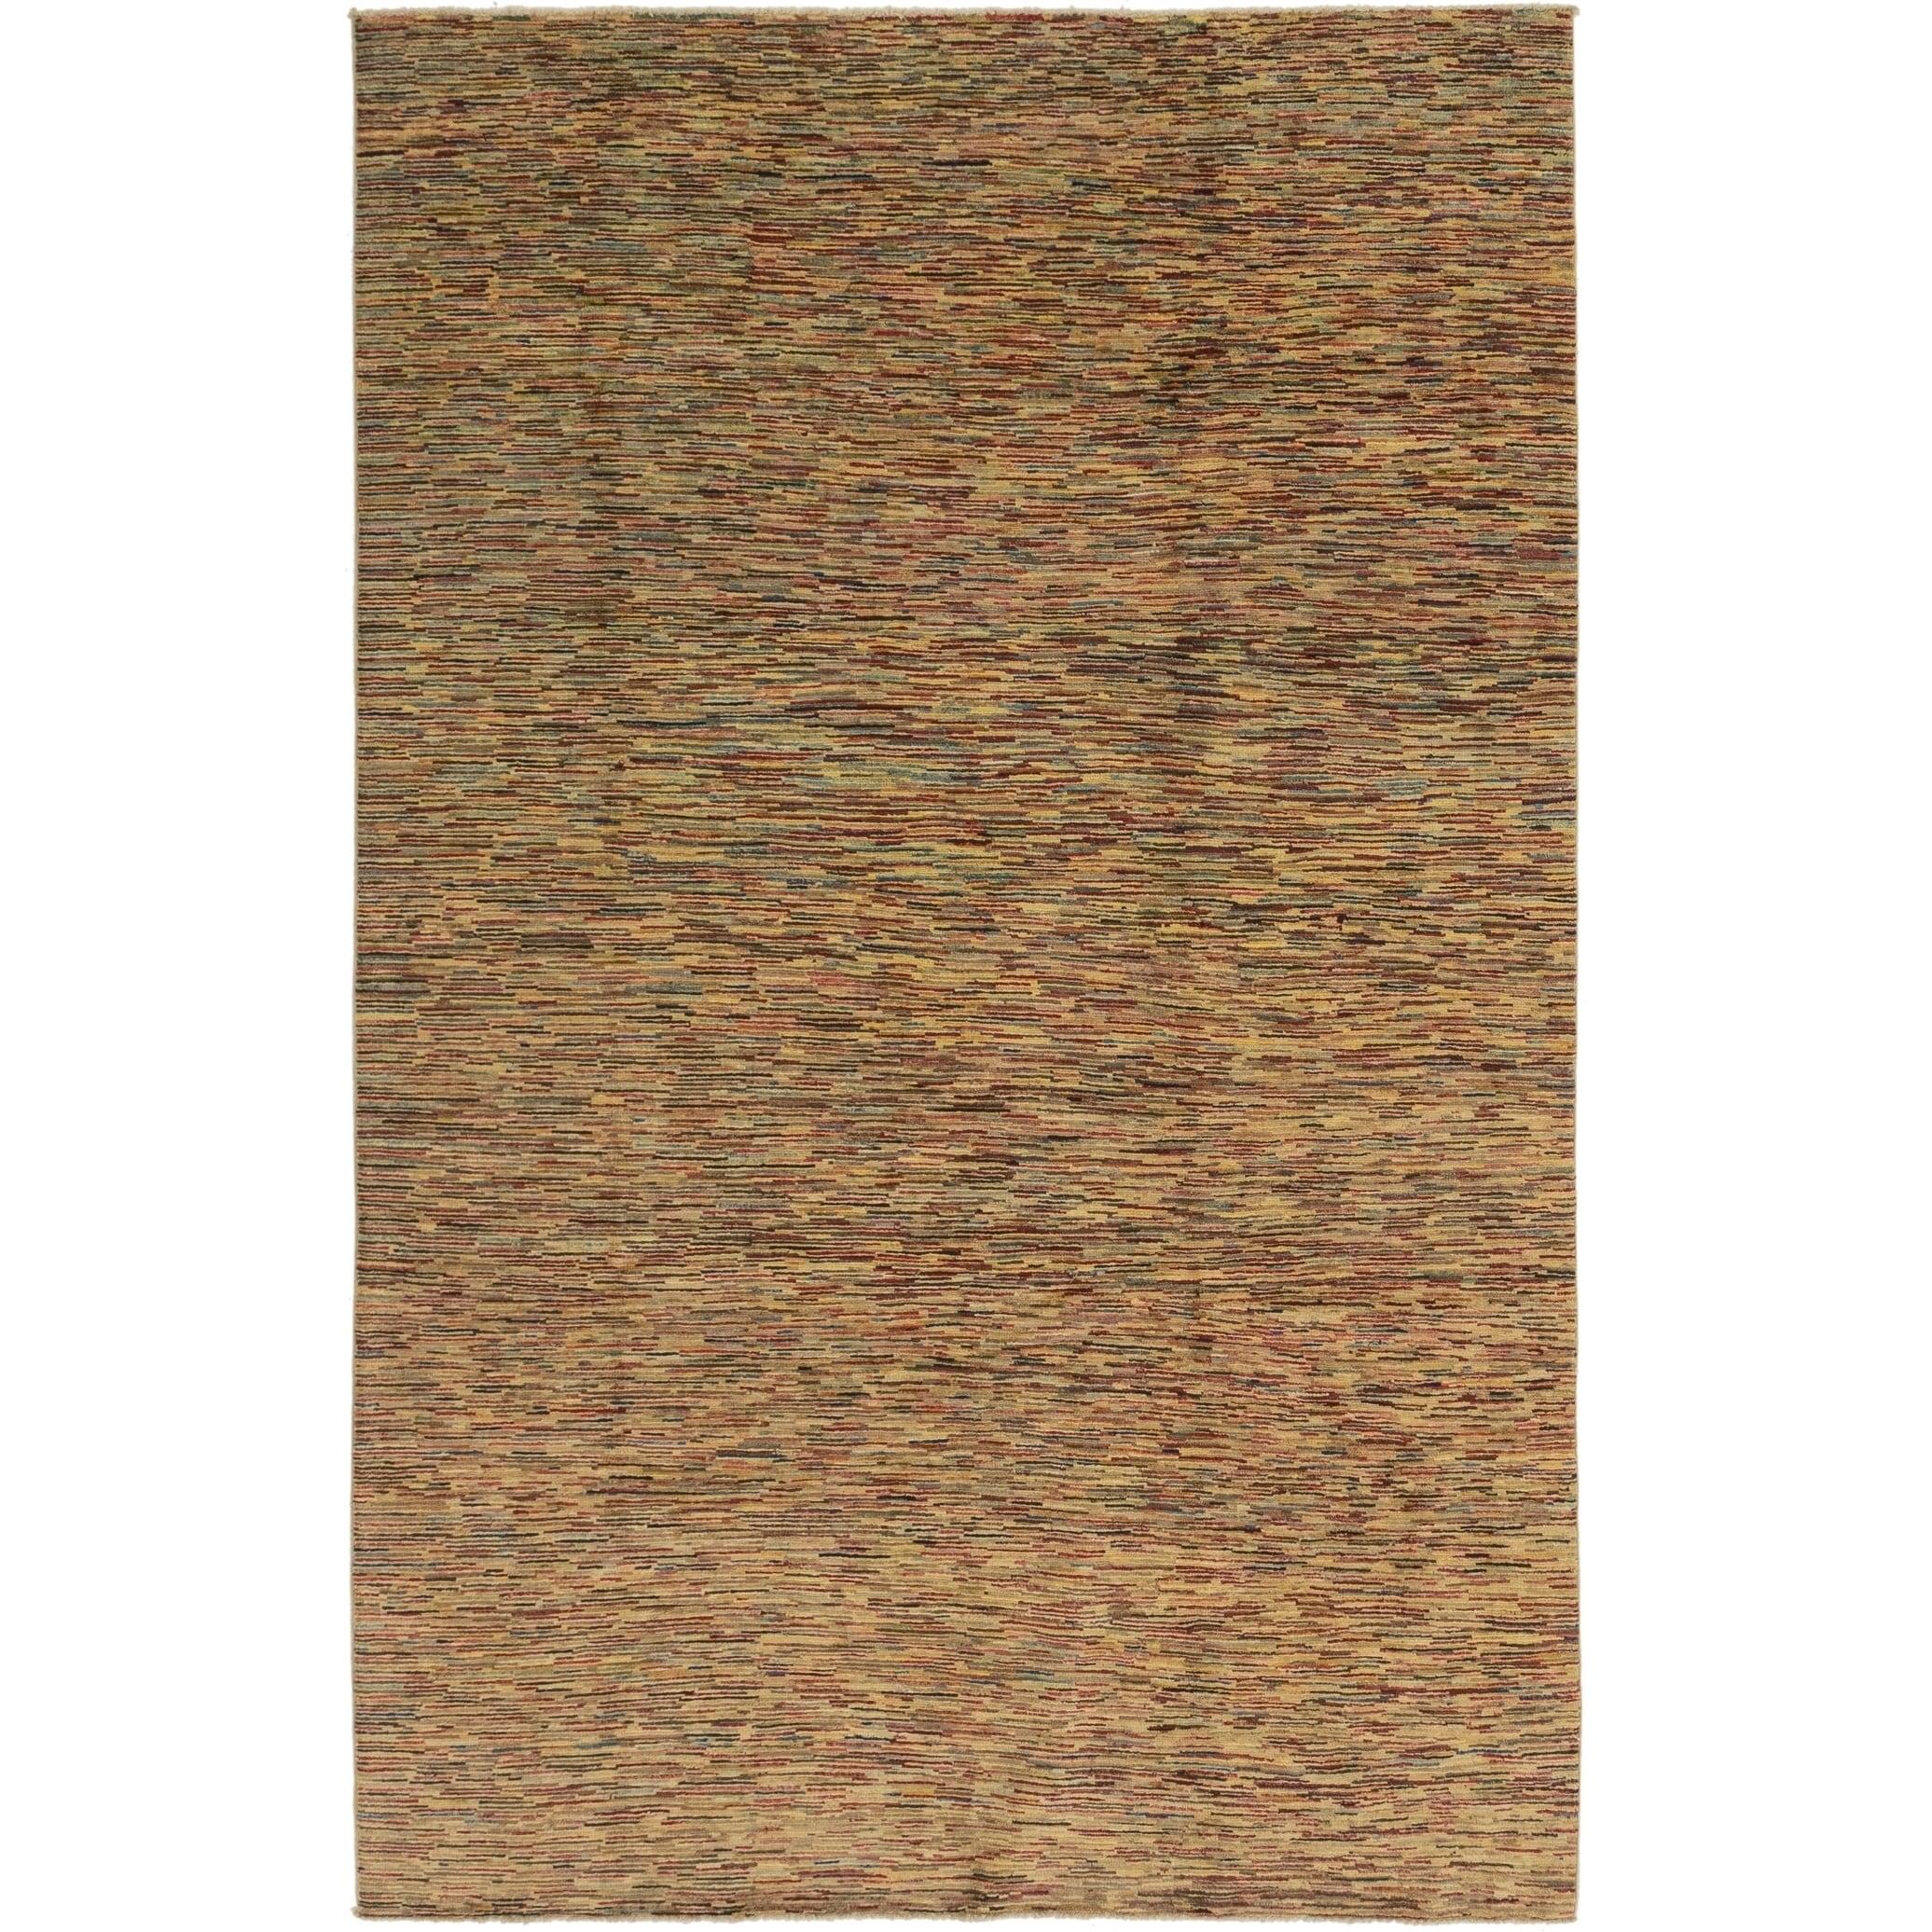 Hand Knotted Kashkuli Gabbeh Wool Area Rug - 6 x 9 4 (Multi - 6 x 9 4)